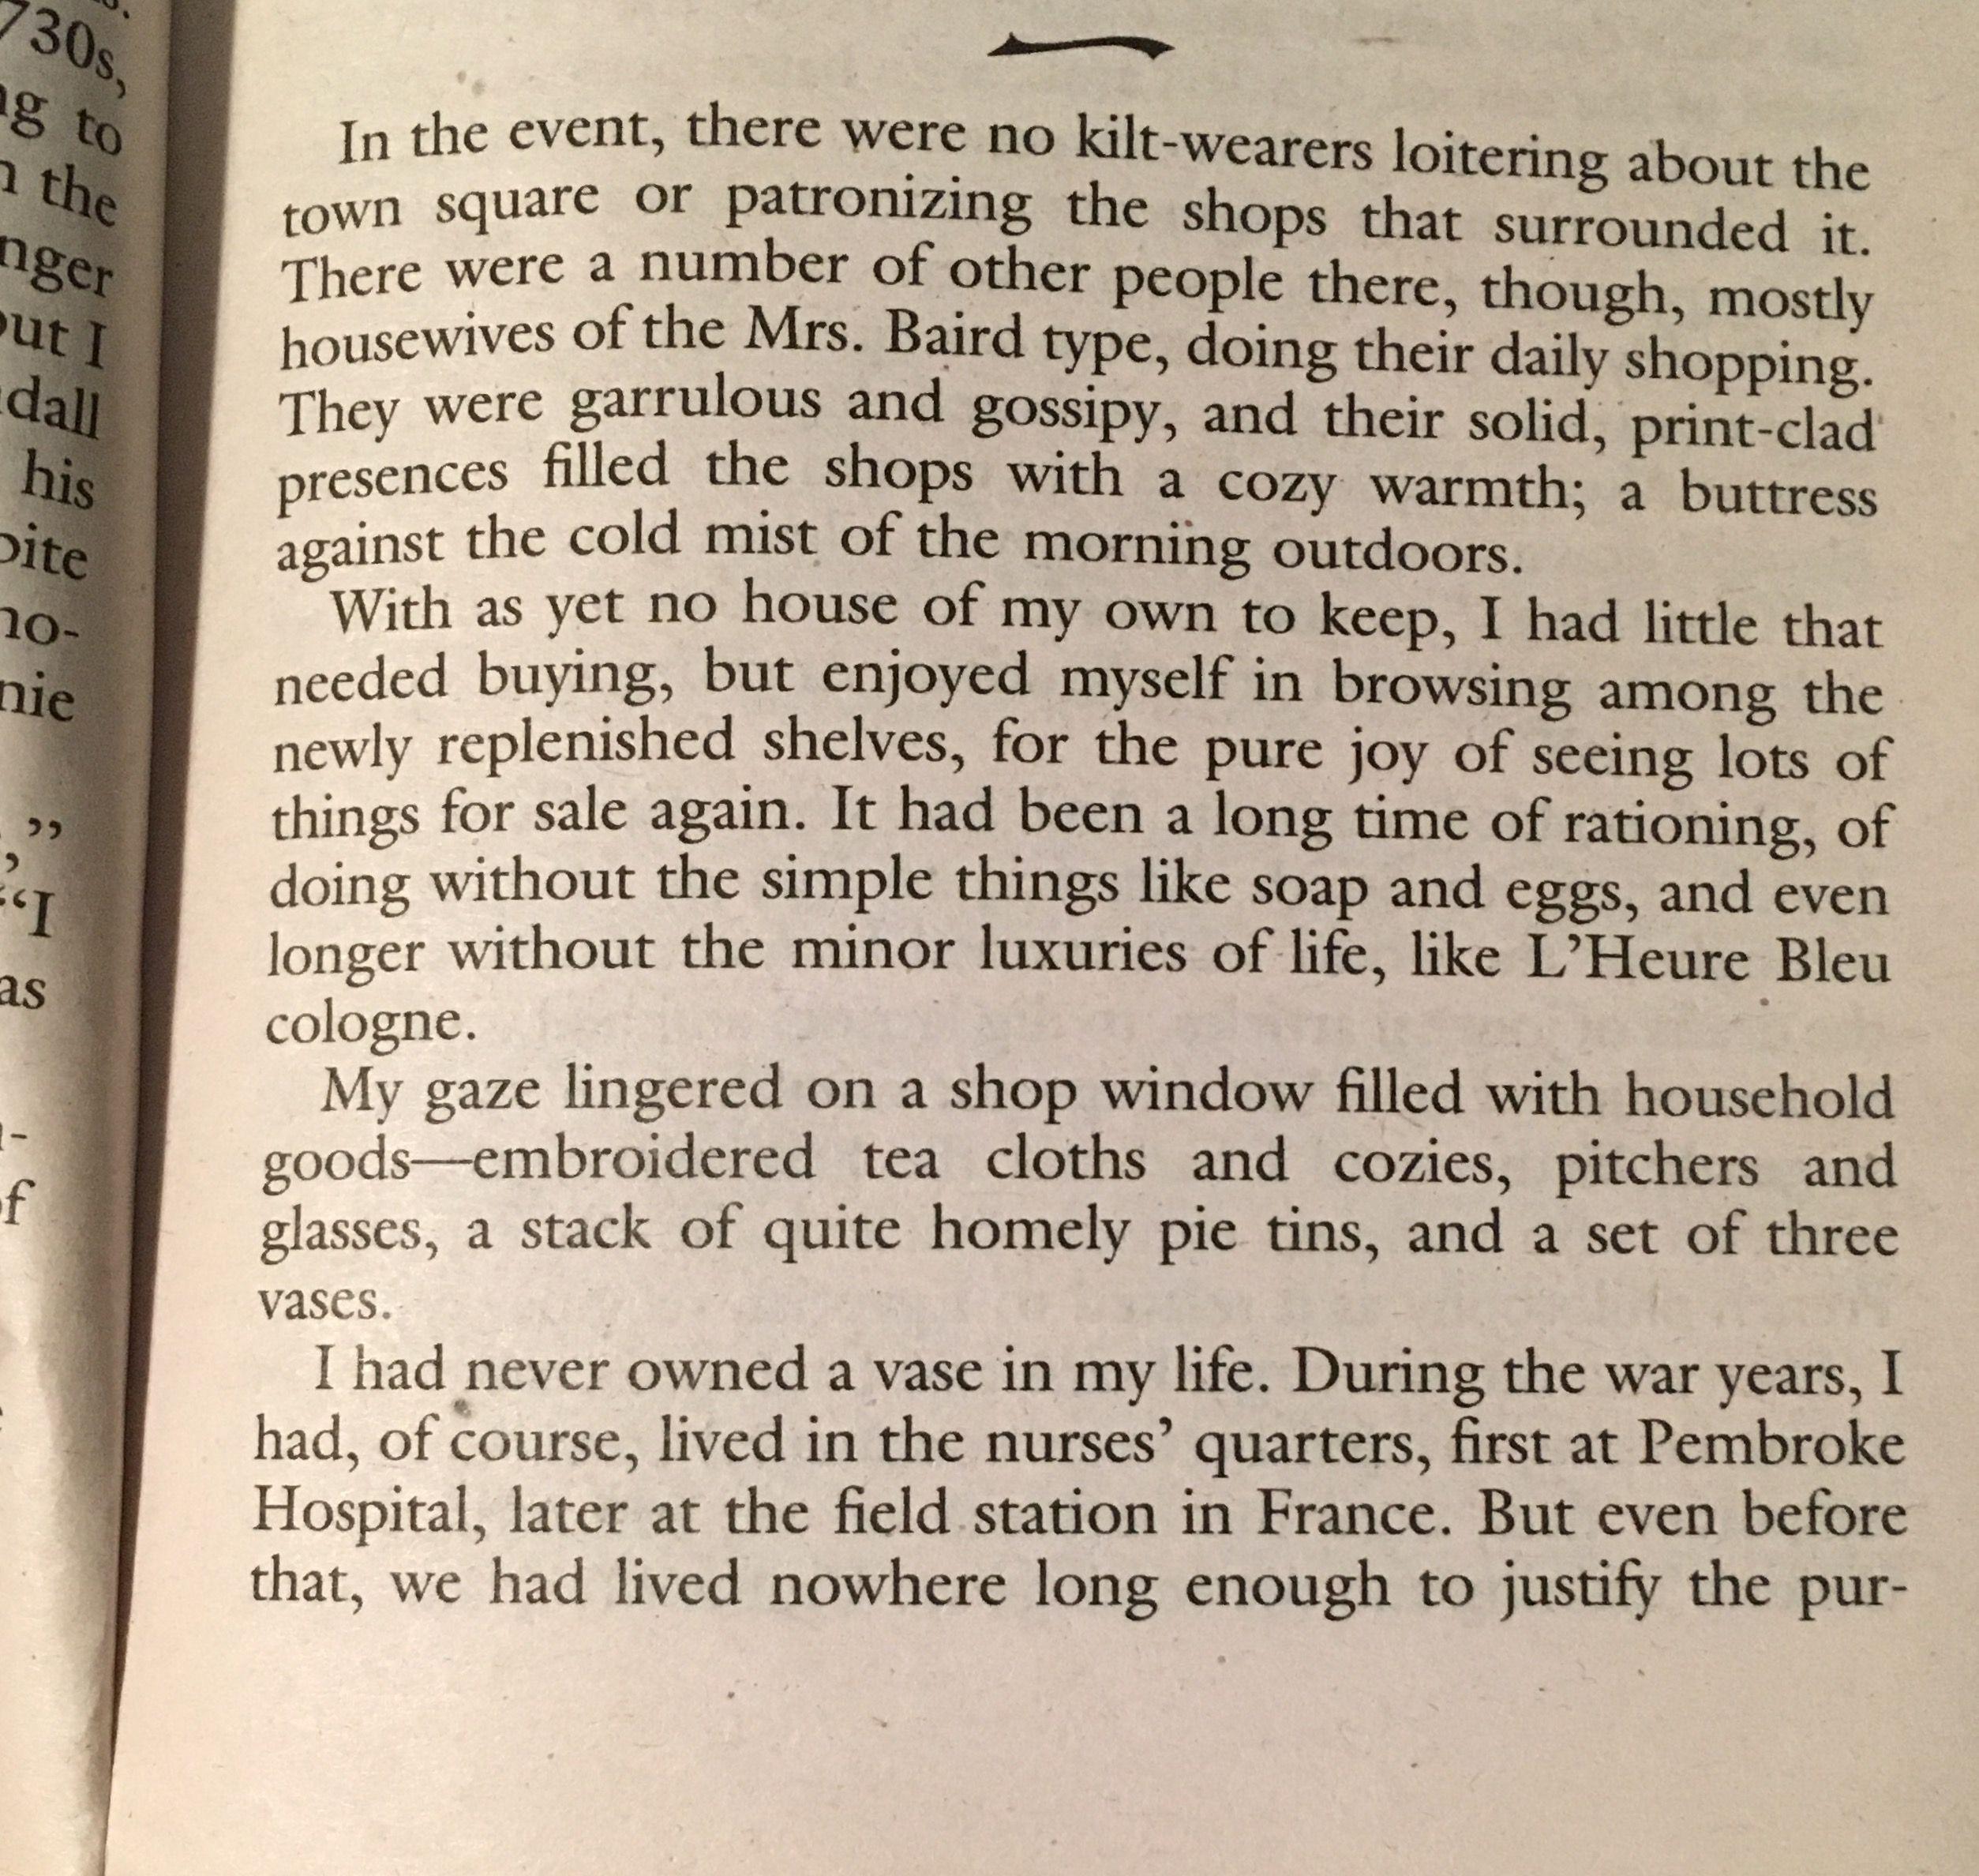 ending paragraphs